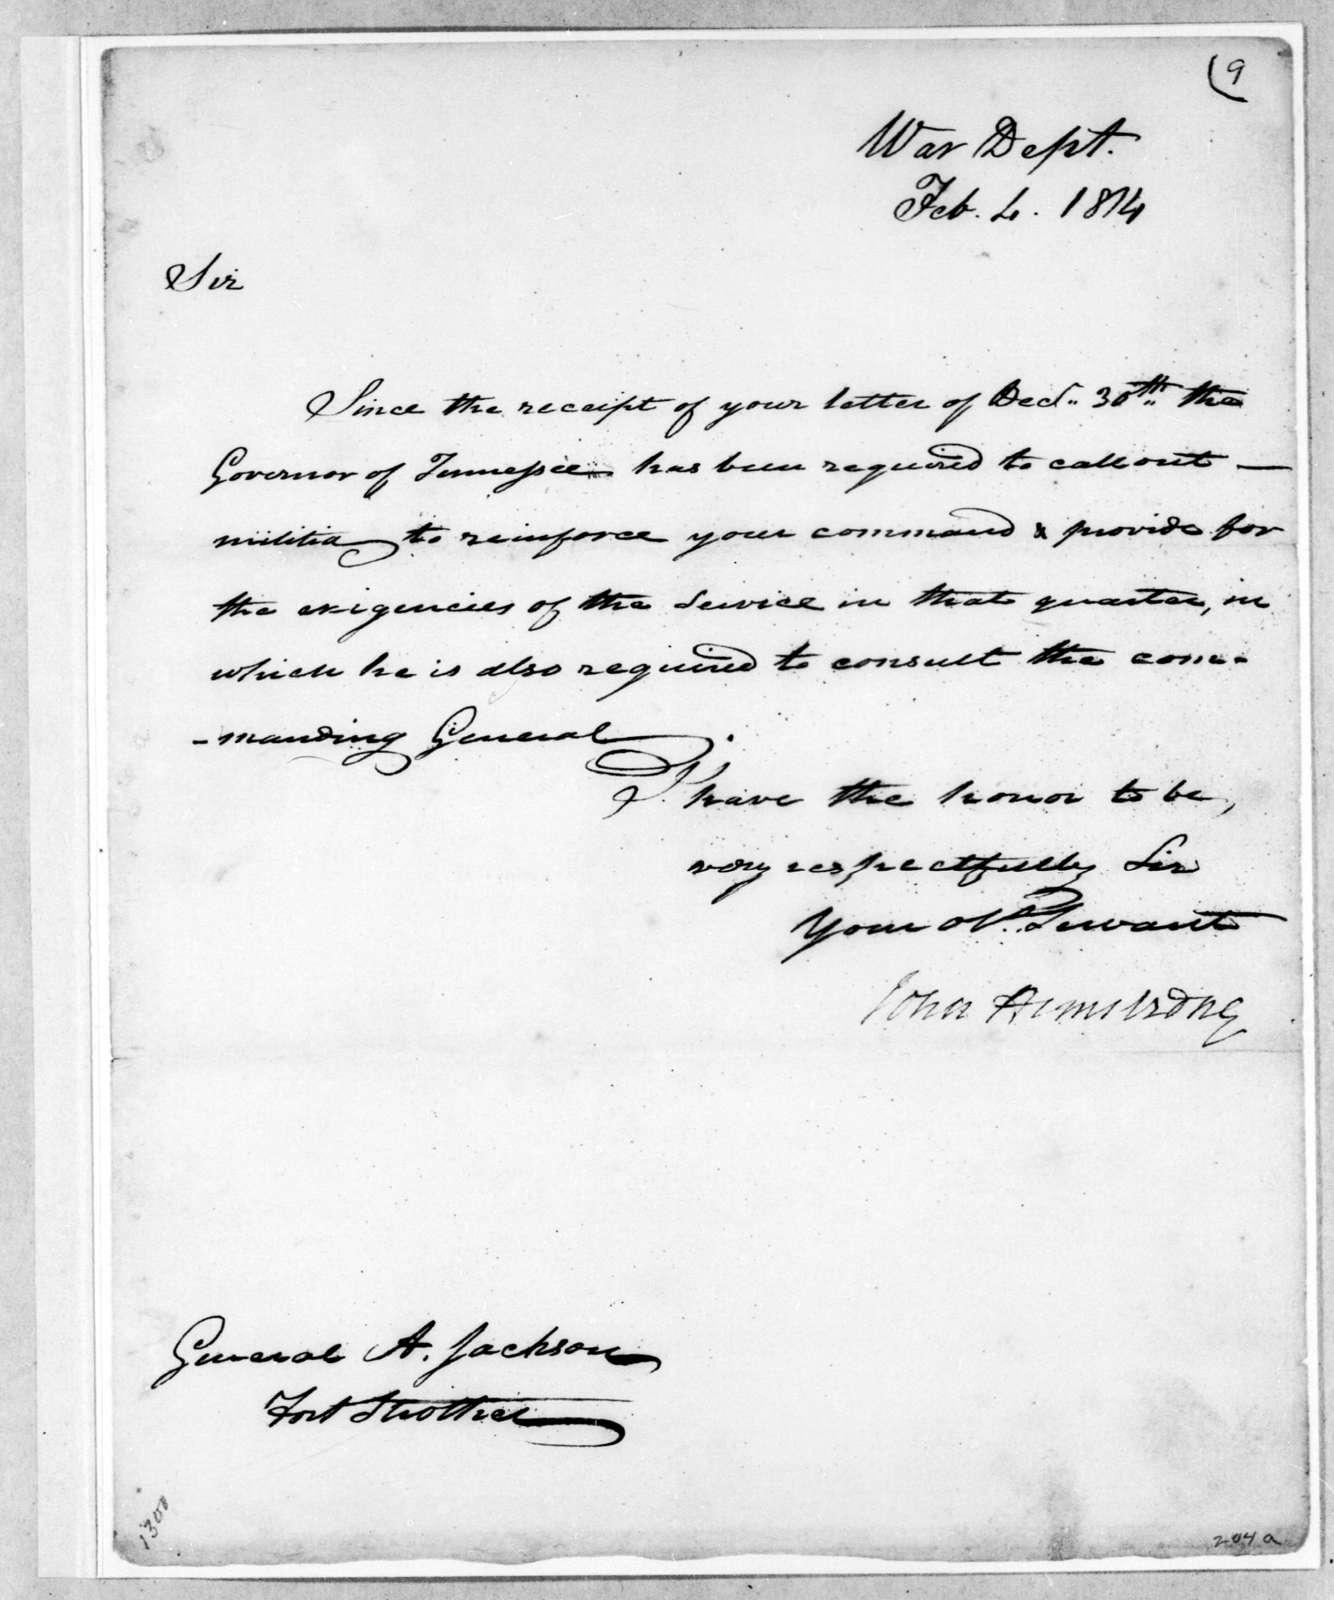 John Armstrong to Andrew Jackson, February 4, 1814